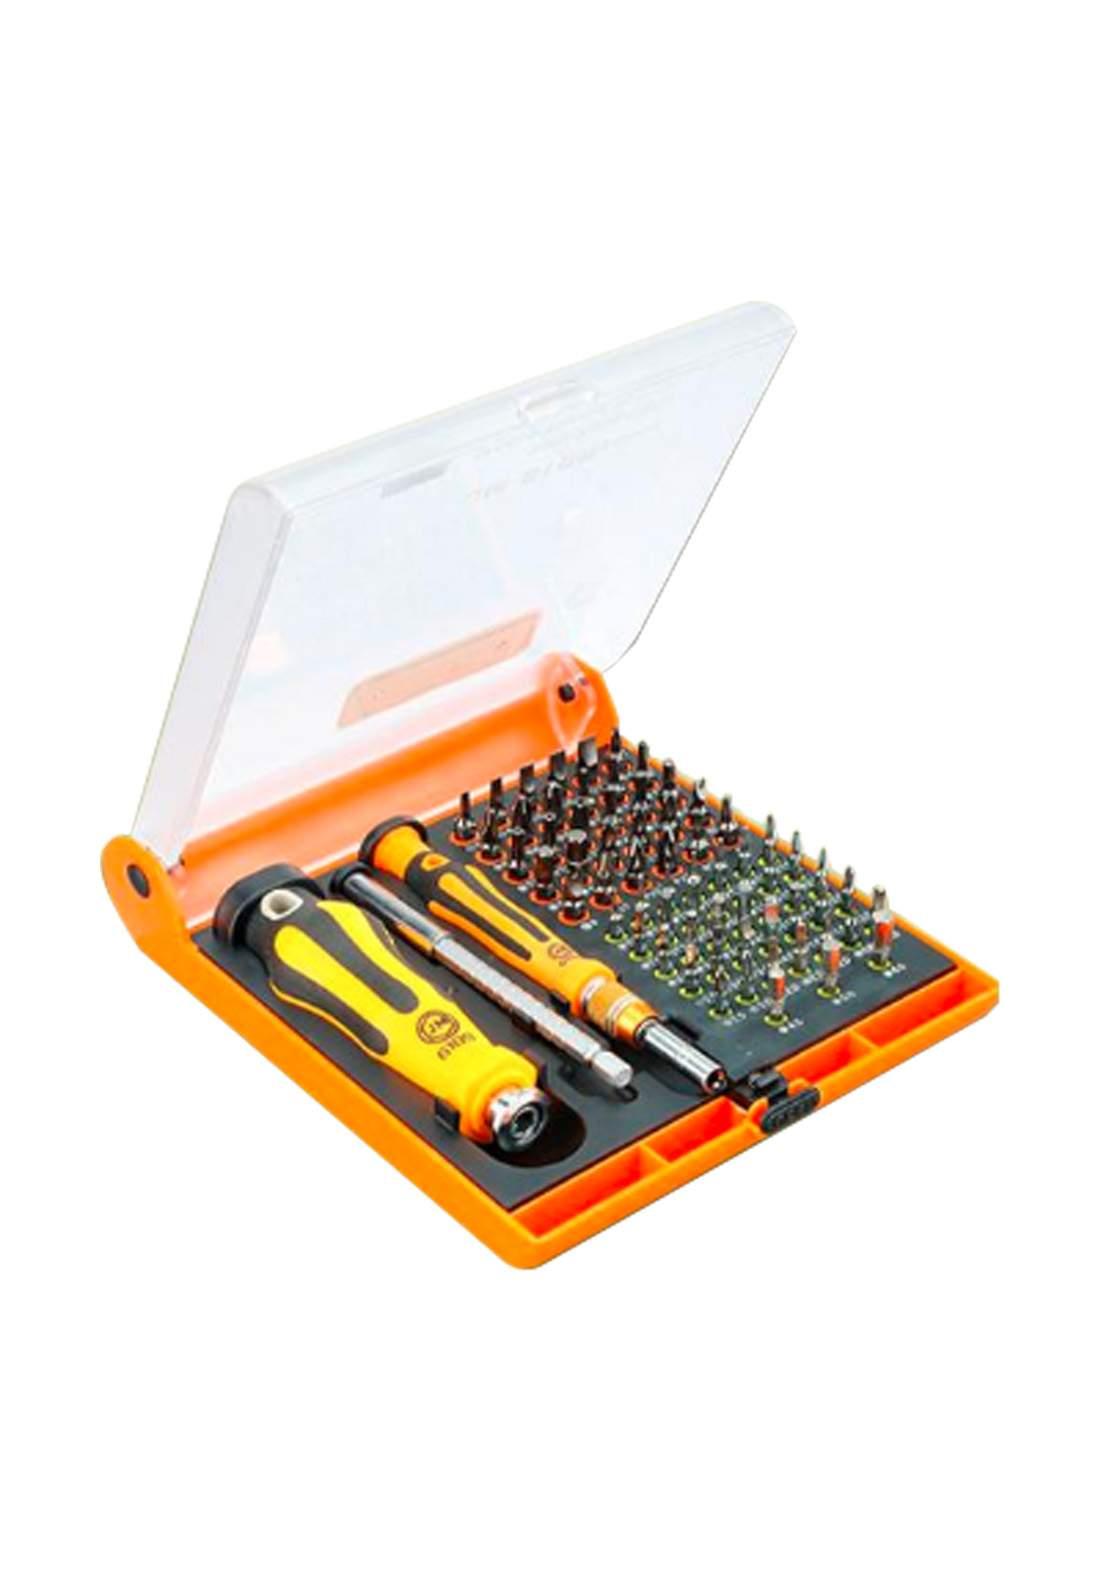 Jakemy JM-6109 72 in 1 Screwdriver Set Multi-function Tool Kit for Maintenance سيت رؤوس درنفيس